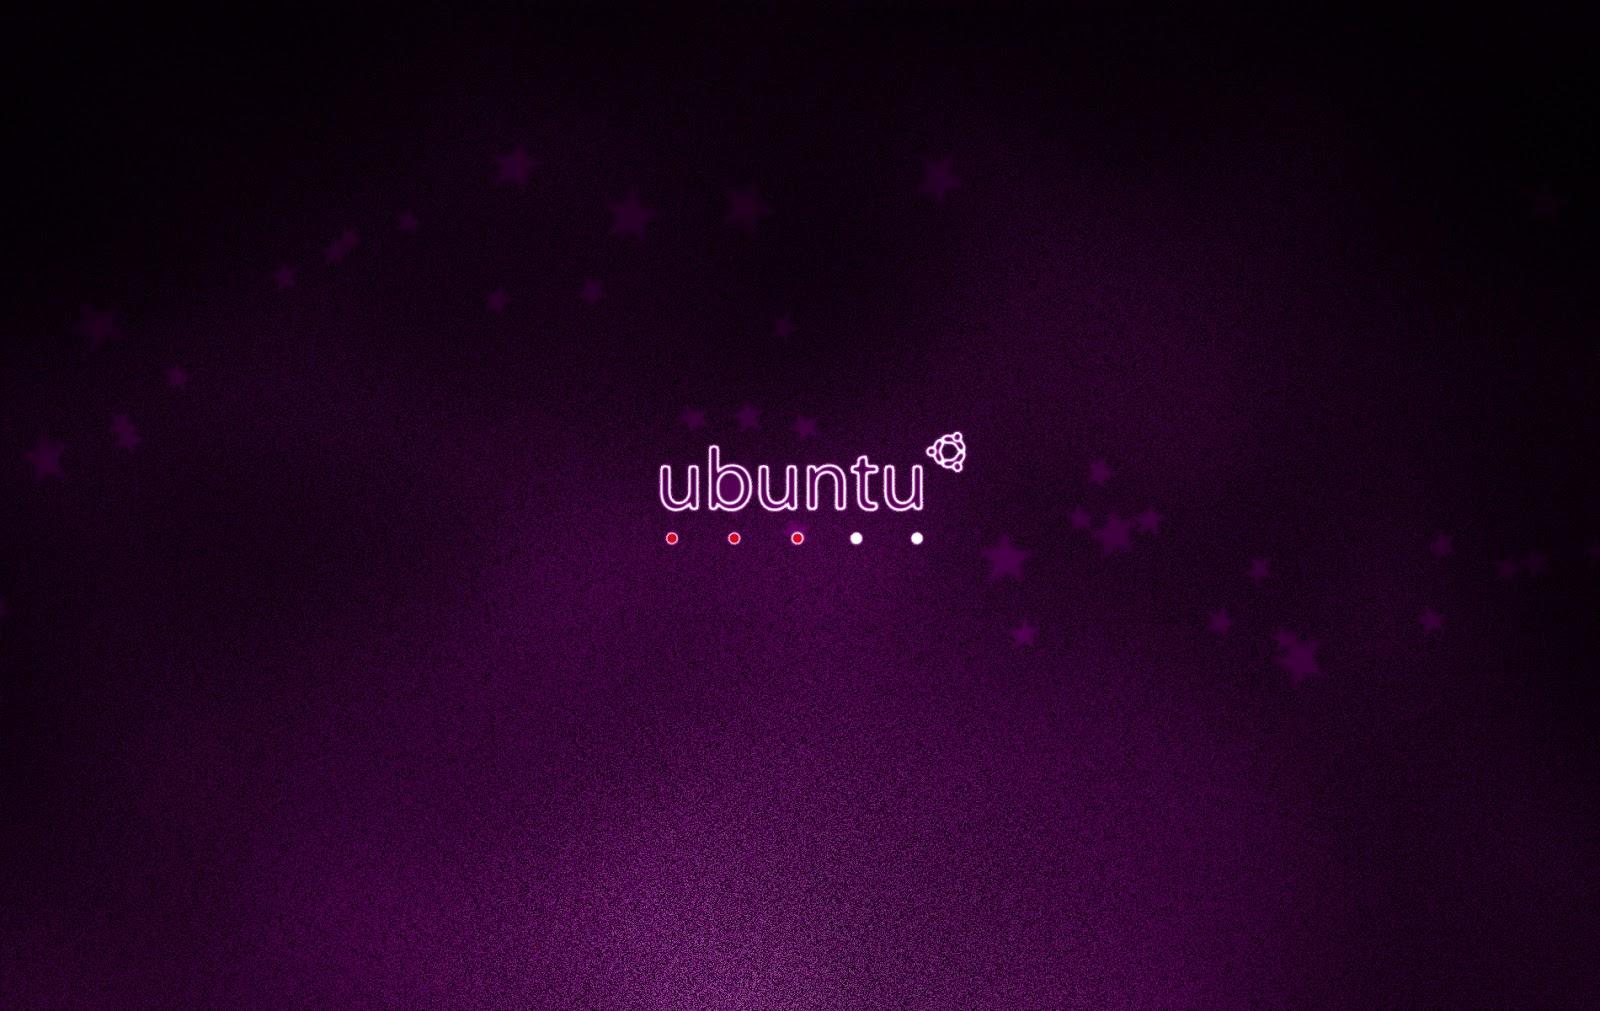 HD Wallpapers: UBUNTU HD WALLPAPERS